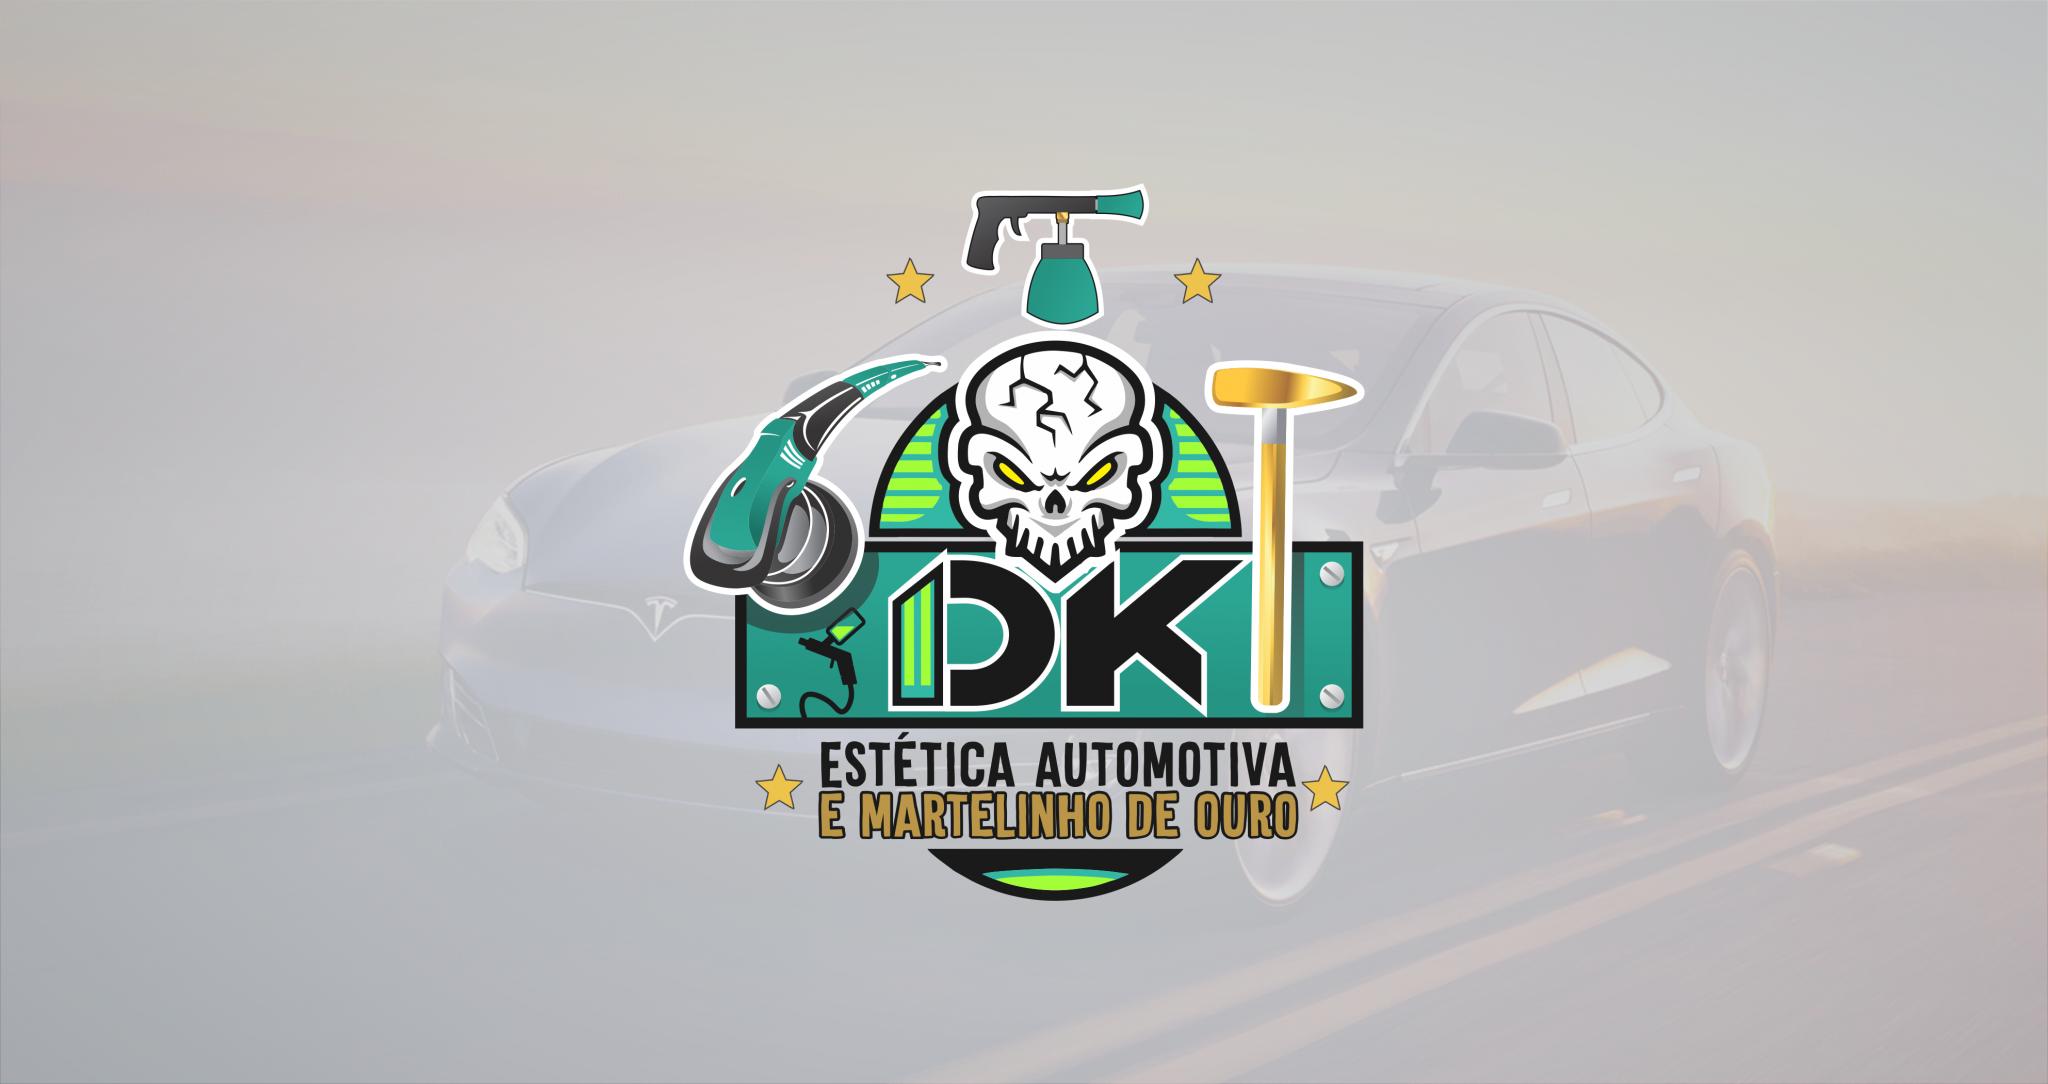 DK ESTÉTICA AUTOMOTIVA